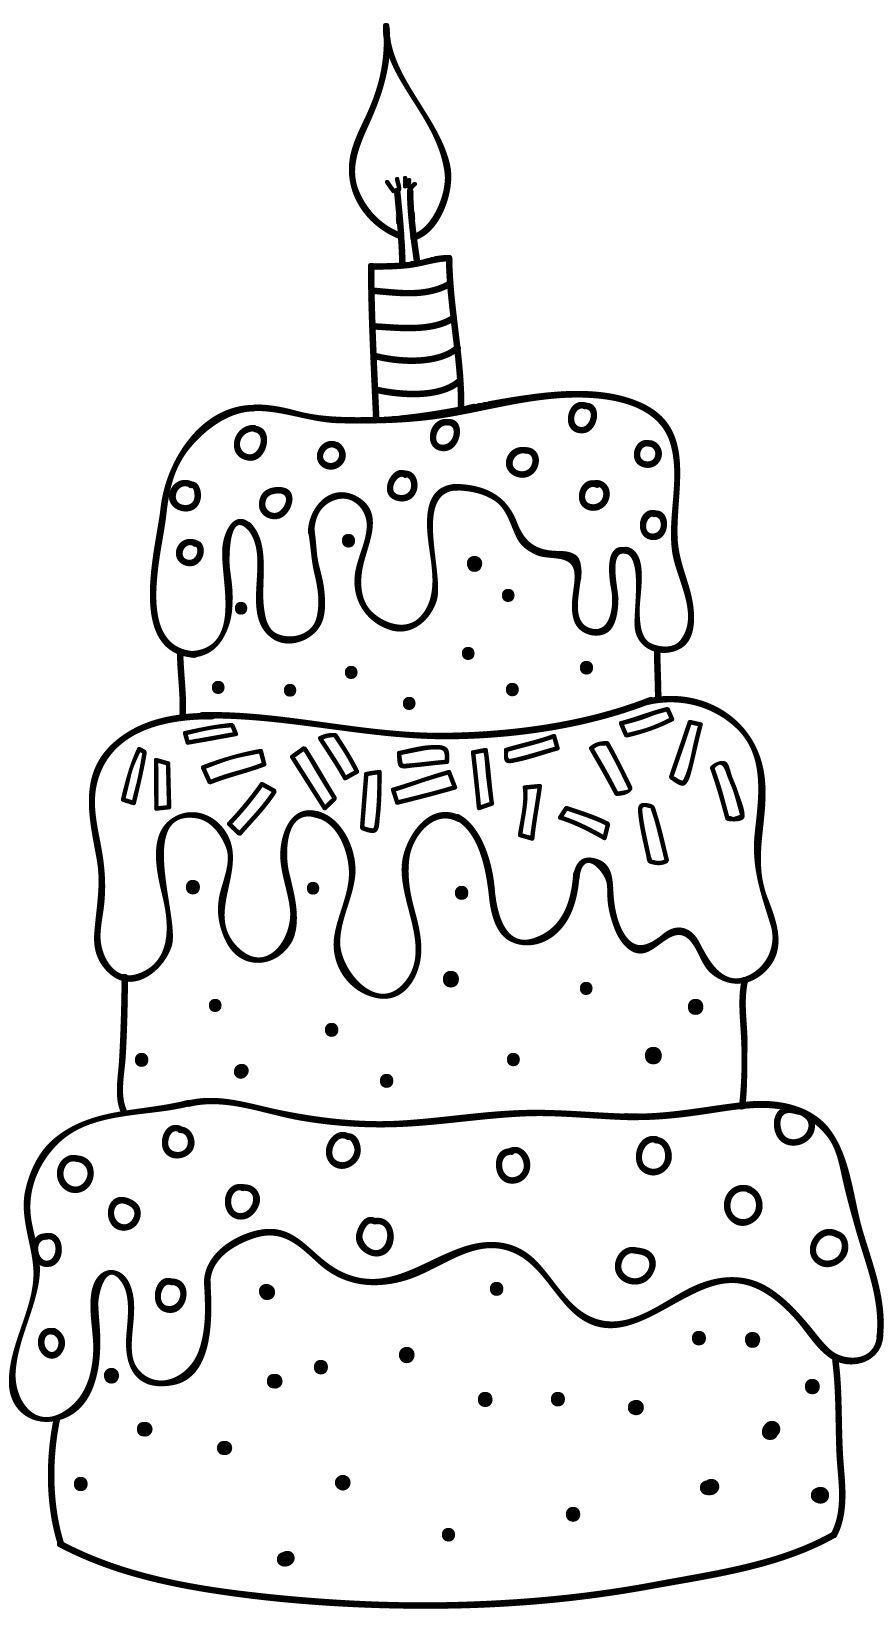 katehadfielddesigns GoogleSuche Birthday coloring